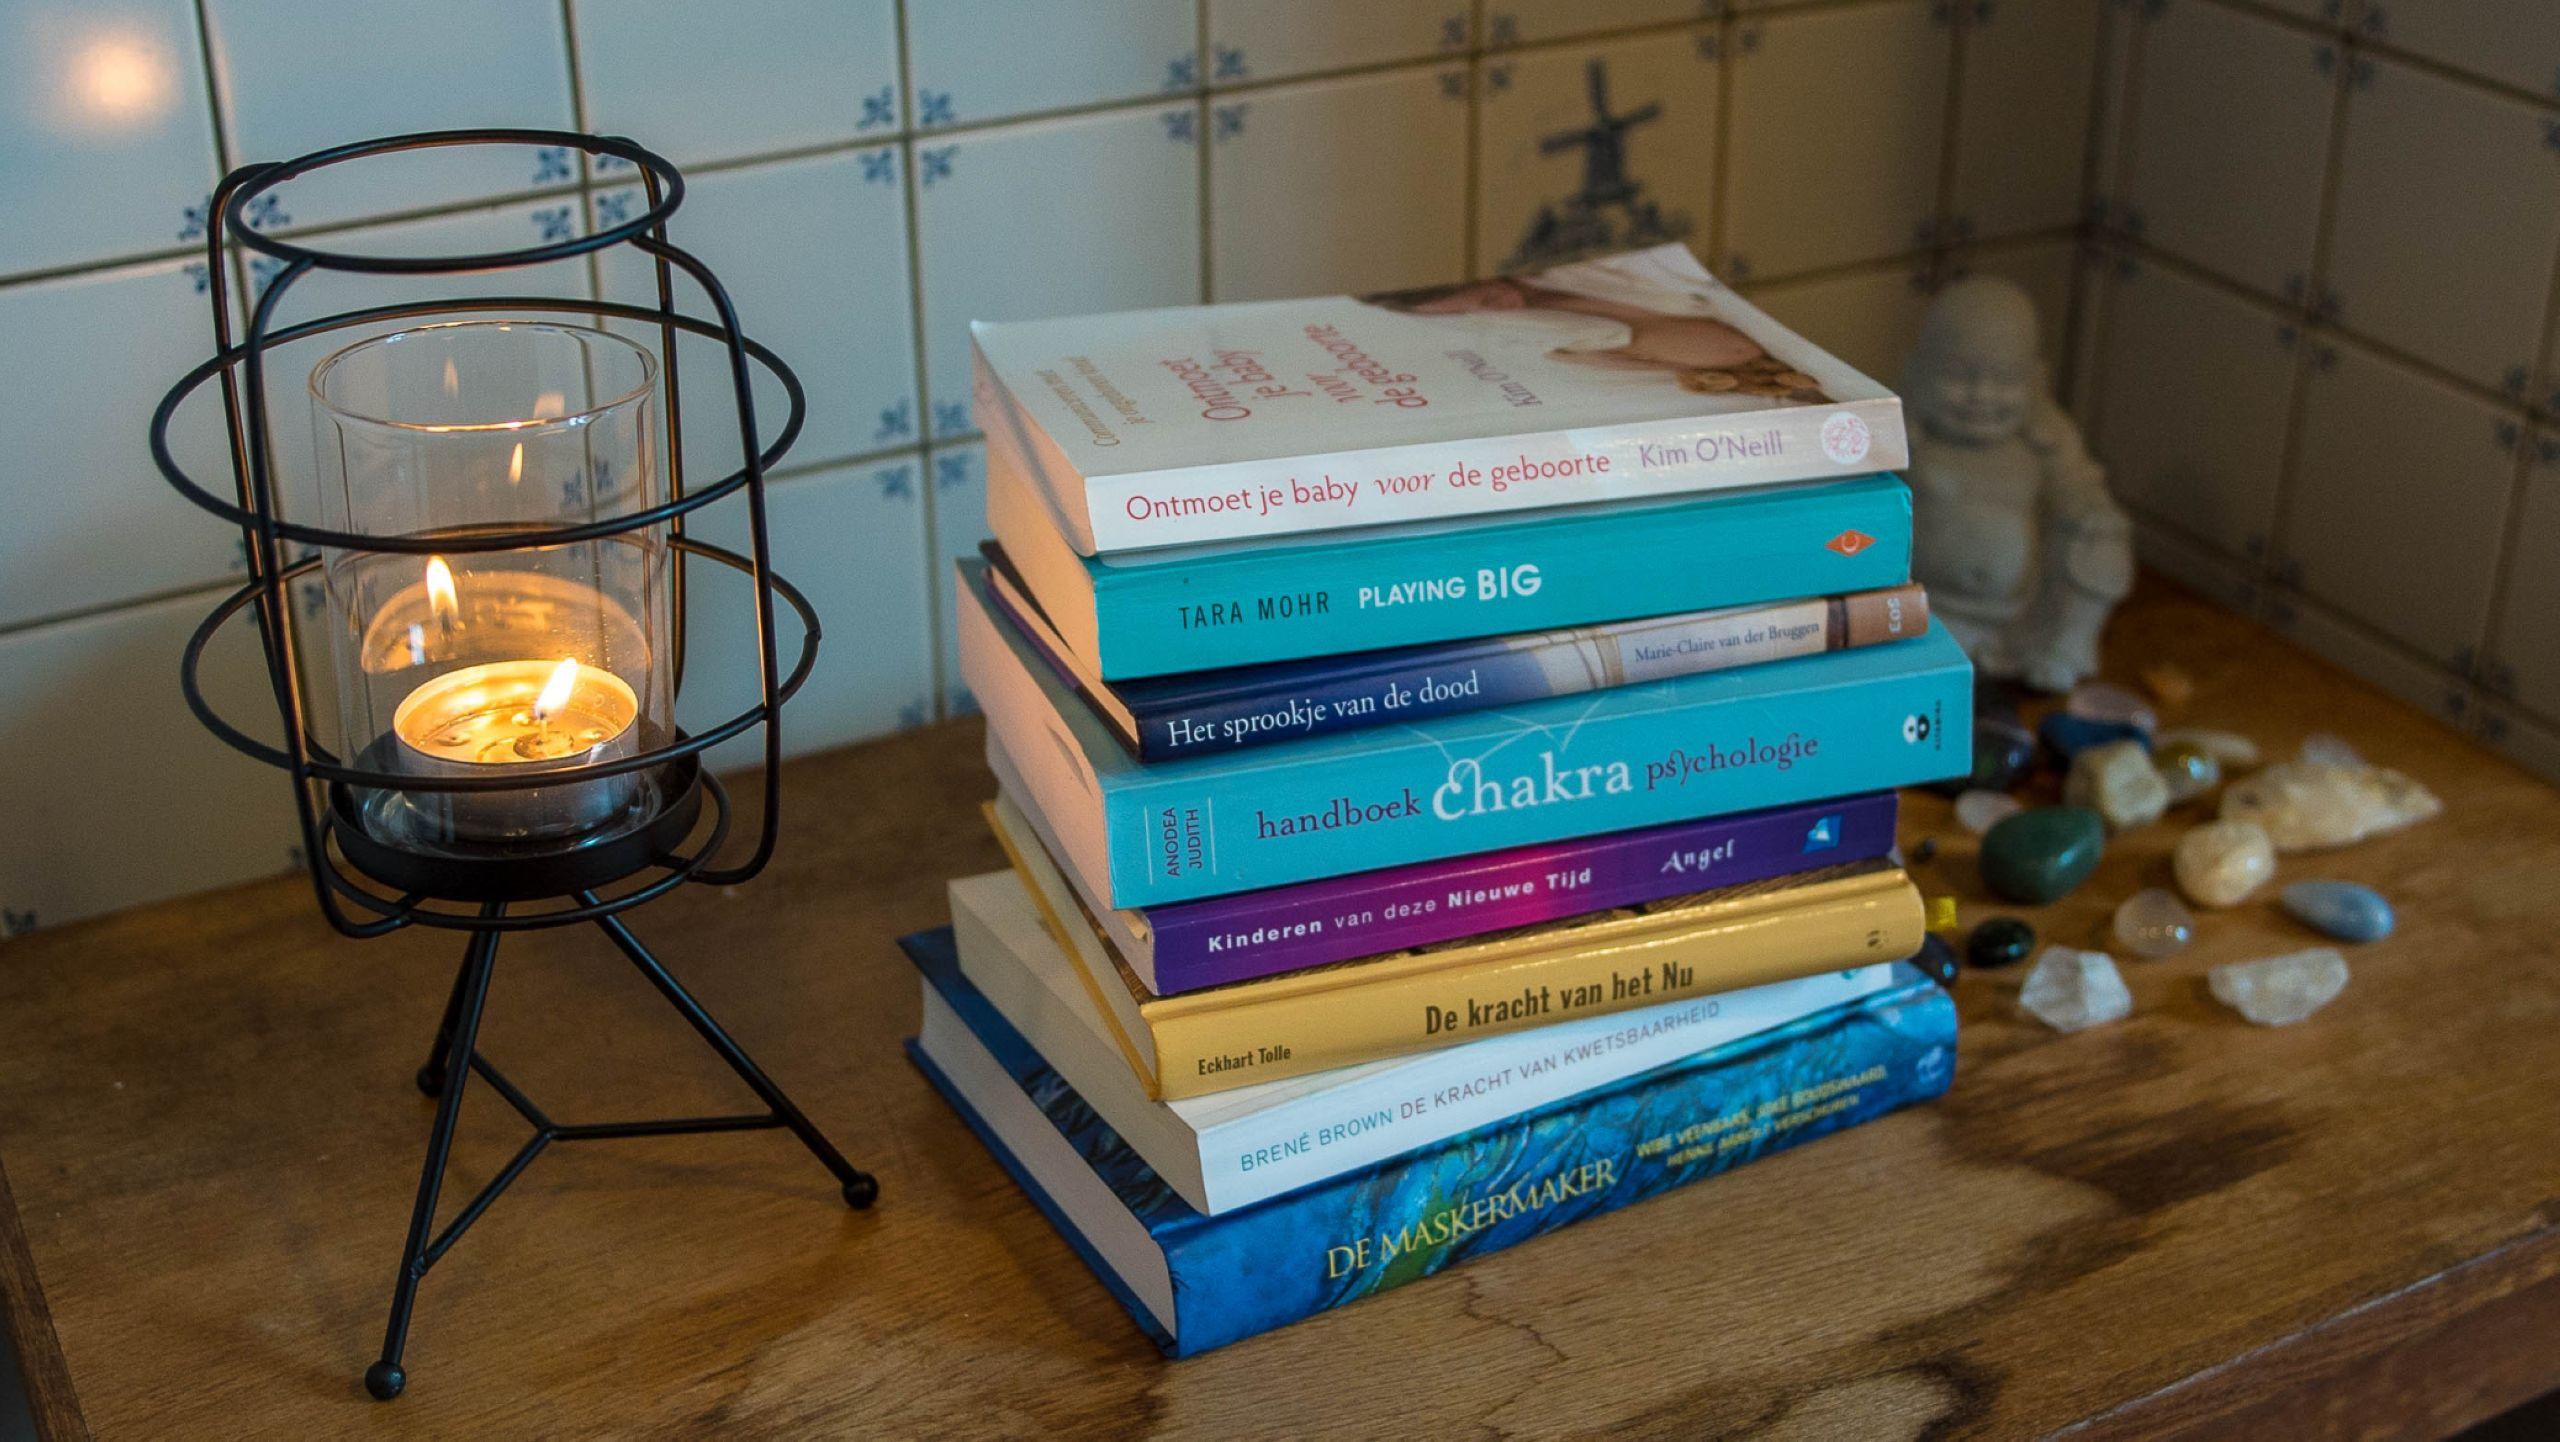 boeken chakra, tara mohr, de maskermaker